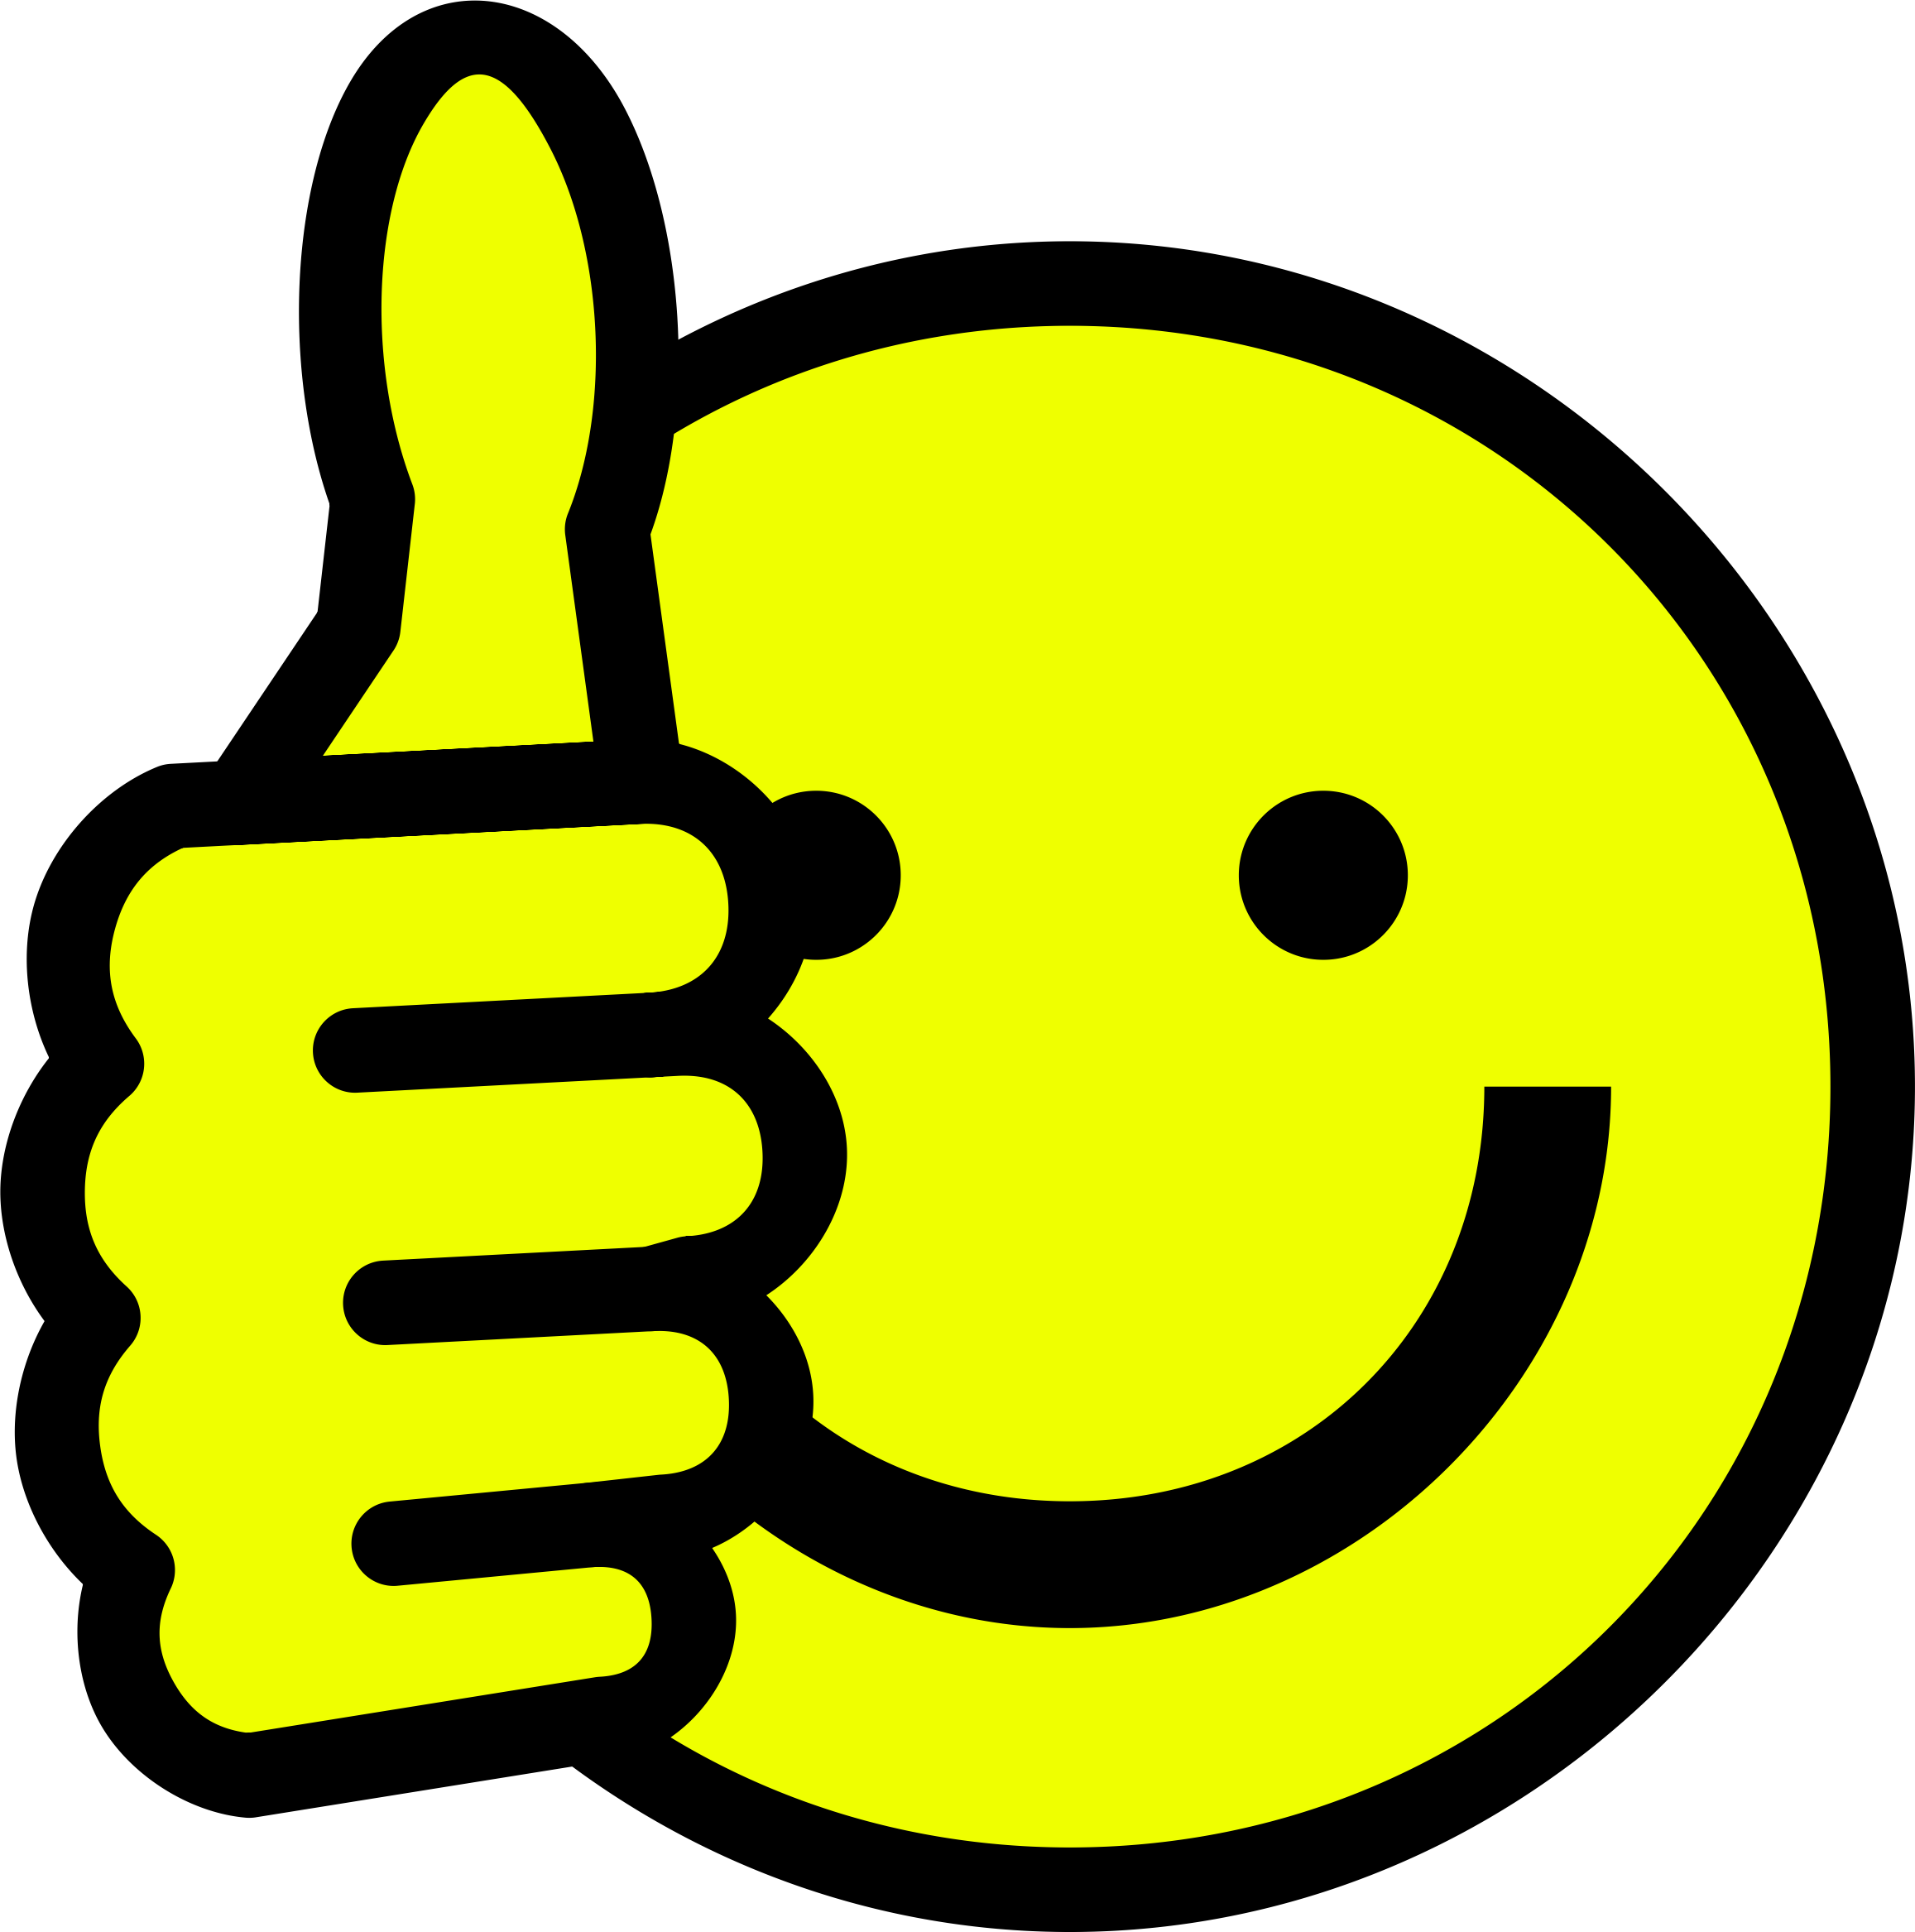 Smileys clipart okay Thumbs smiley up up Thumbs